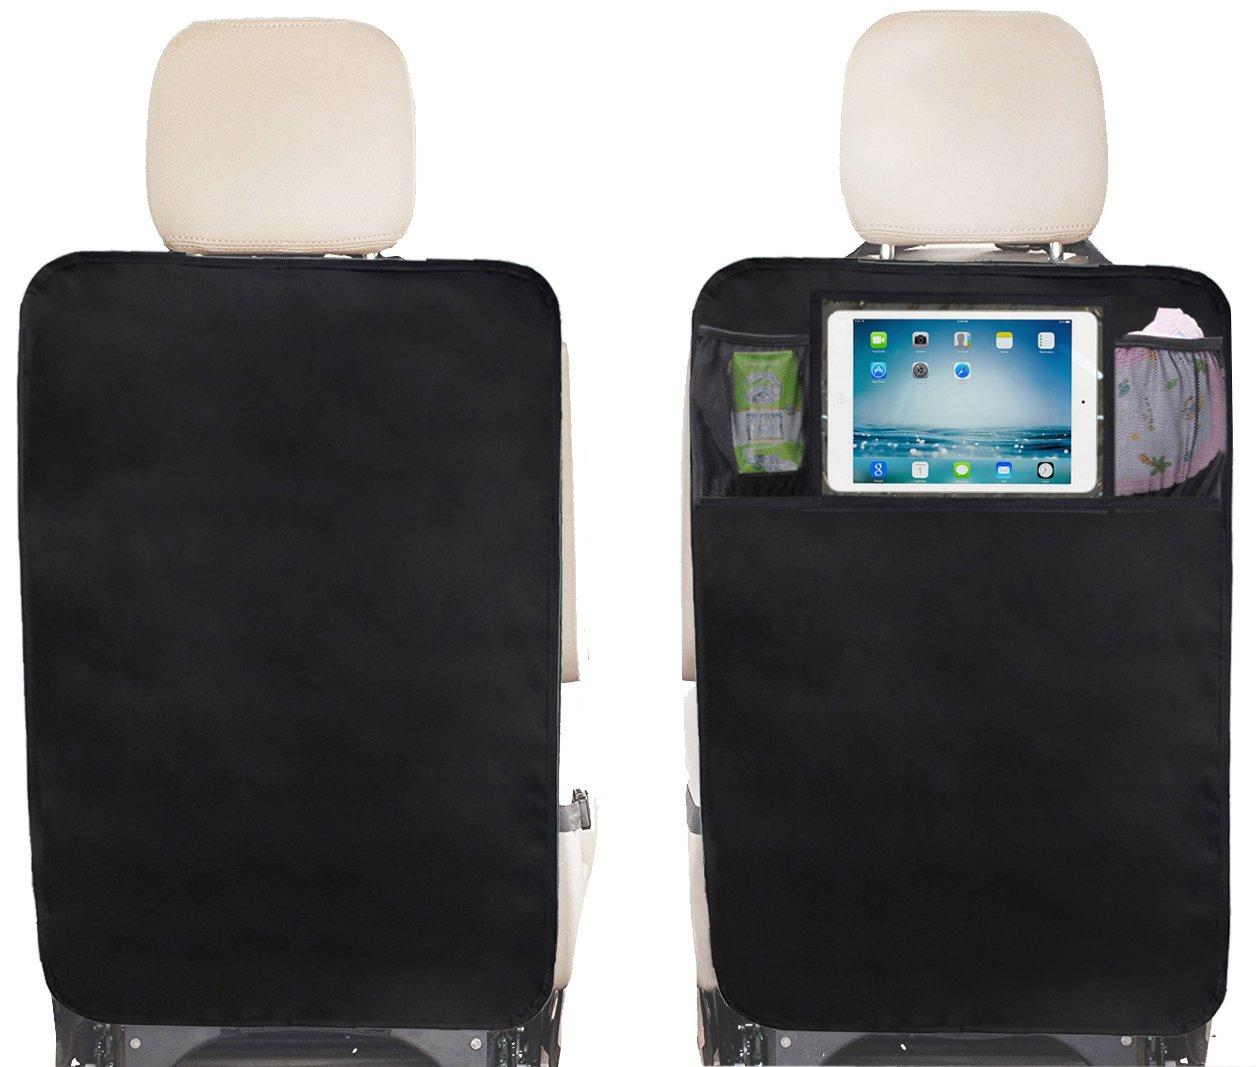 Kick Mats Back Seat Protector 2 Packs with Clear IPAD Holder and Mesh Pocket by Sleeping Lamb